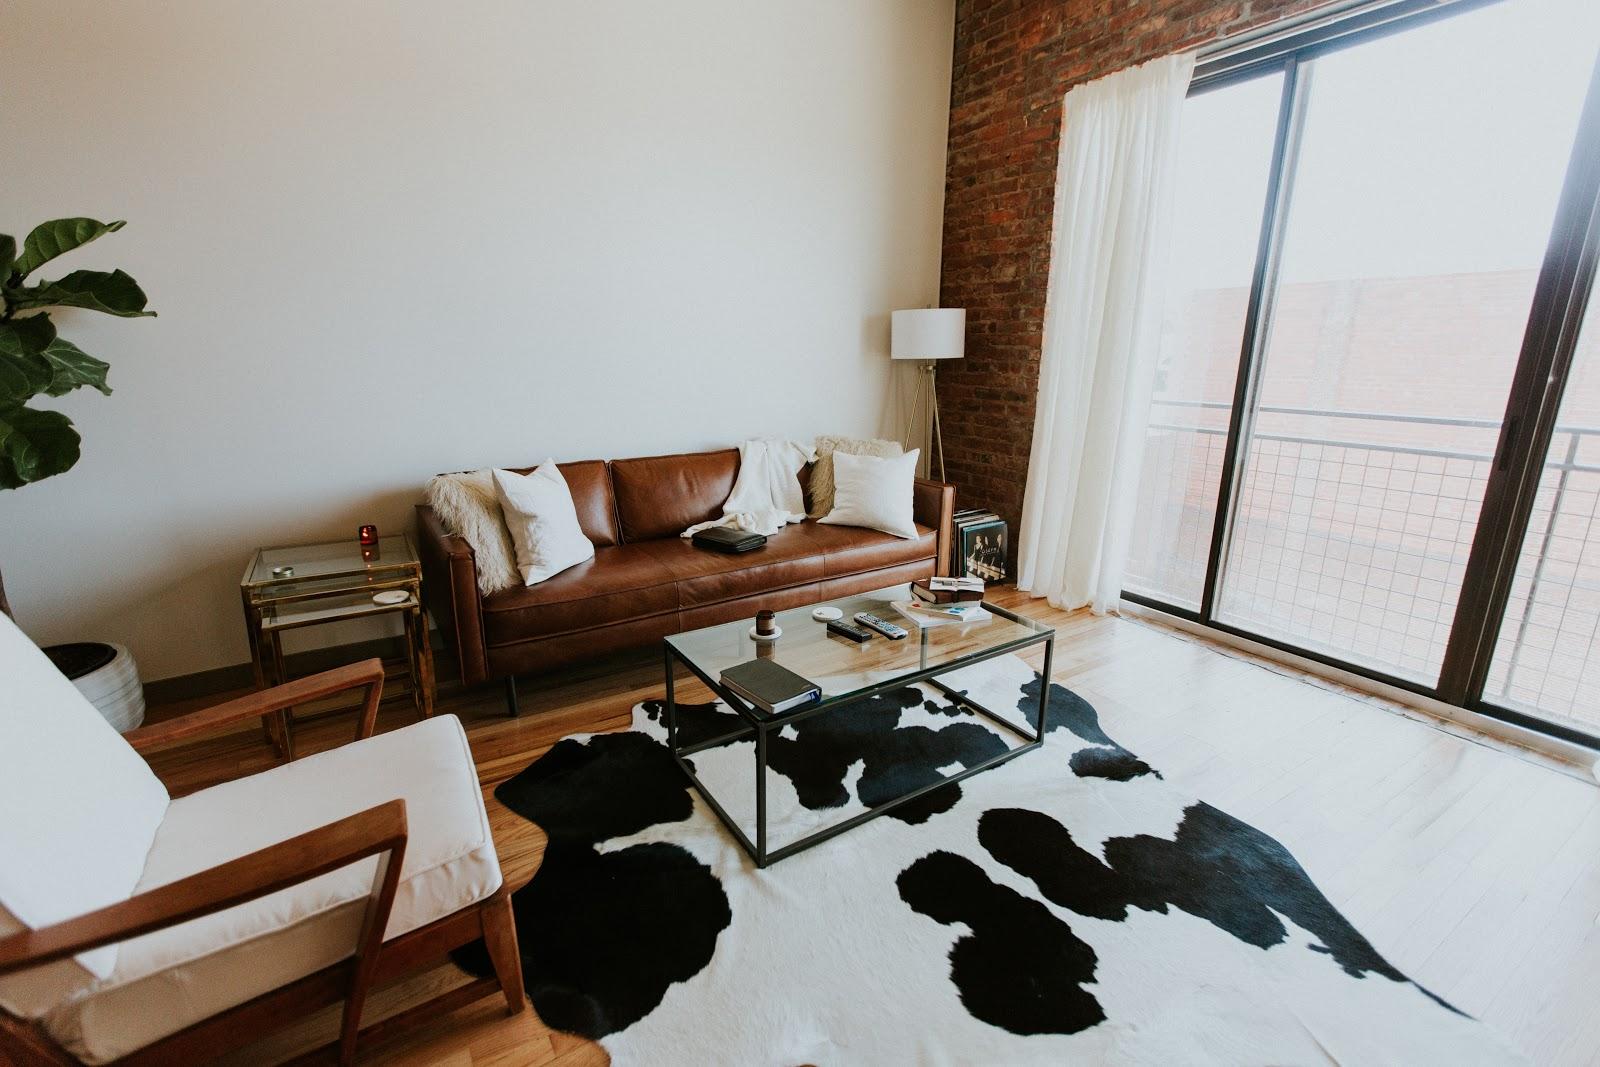 table-wood-house-floor-window-home-property-living-room-furniture-room-interior-design-flooring-1413919.jpg